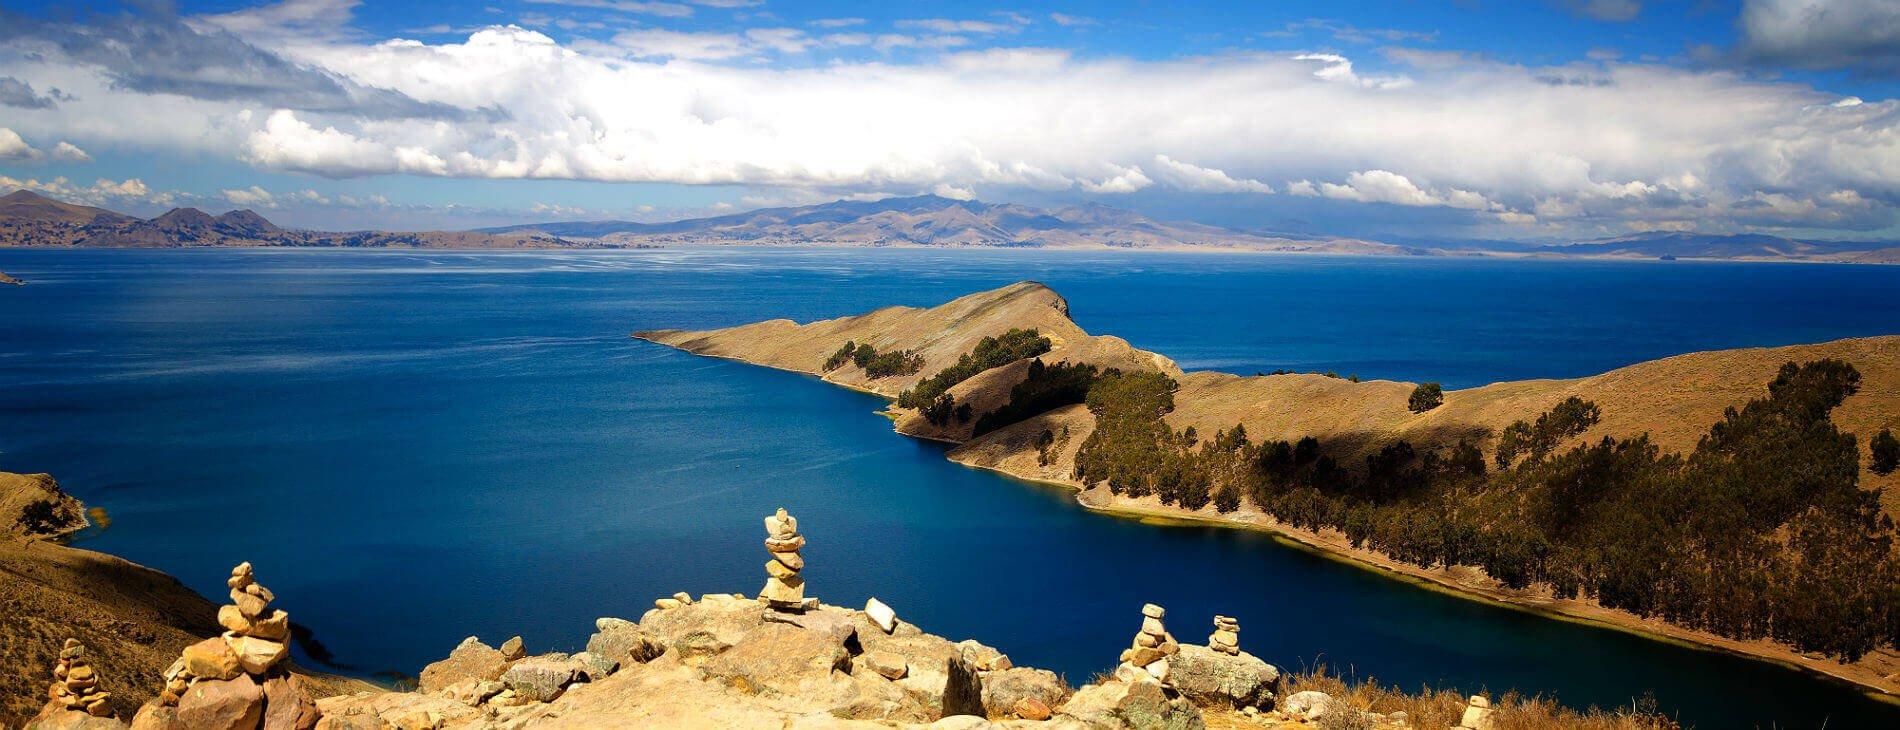 Mastroviaggiatore-peru-bolivia-titicaca